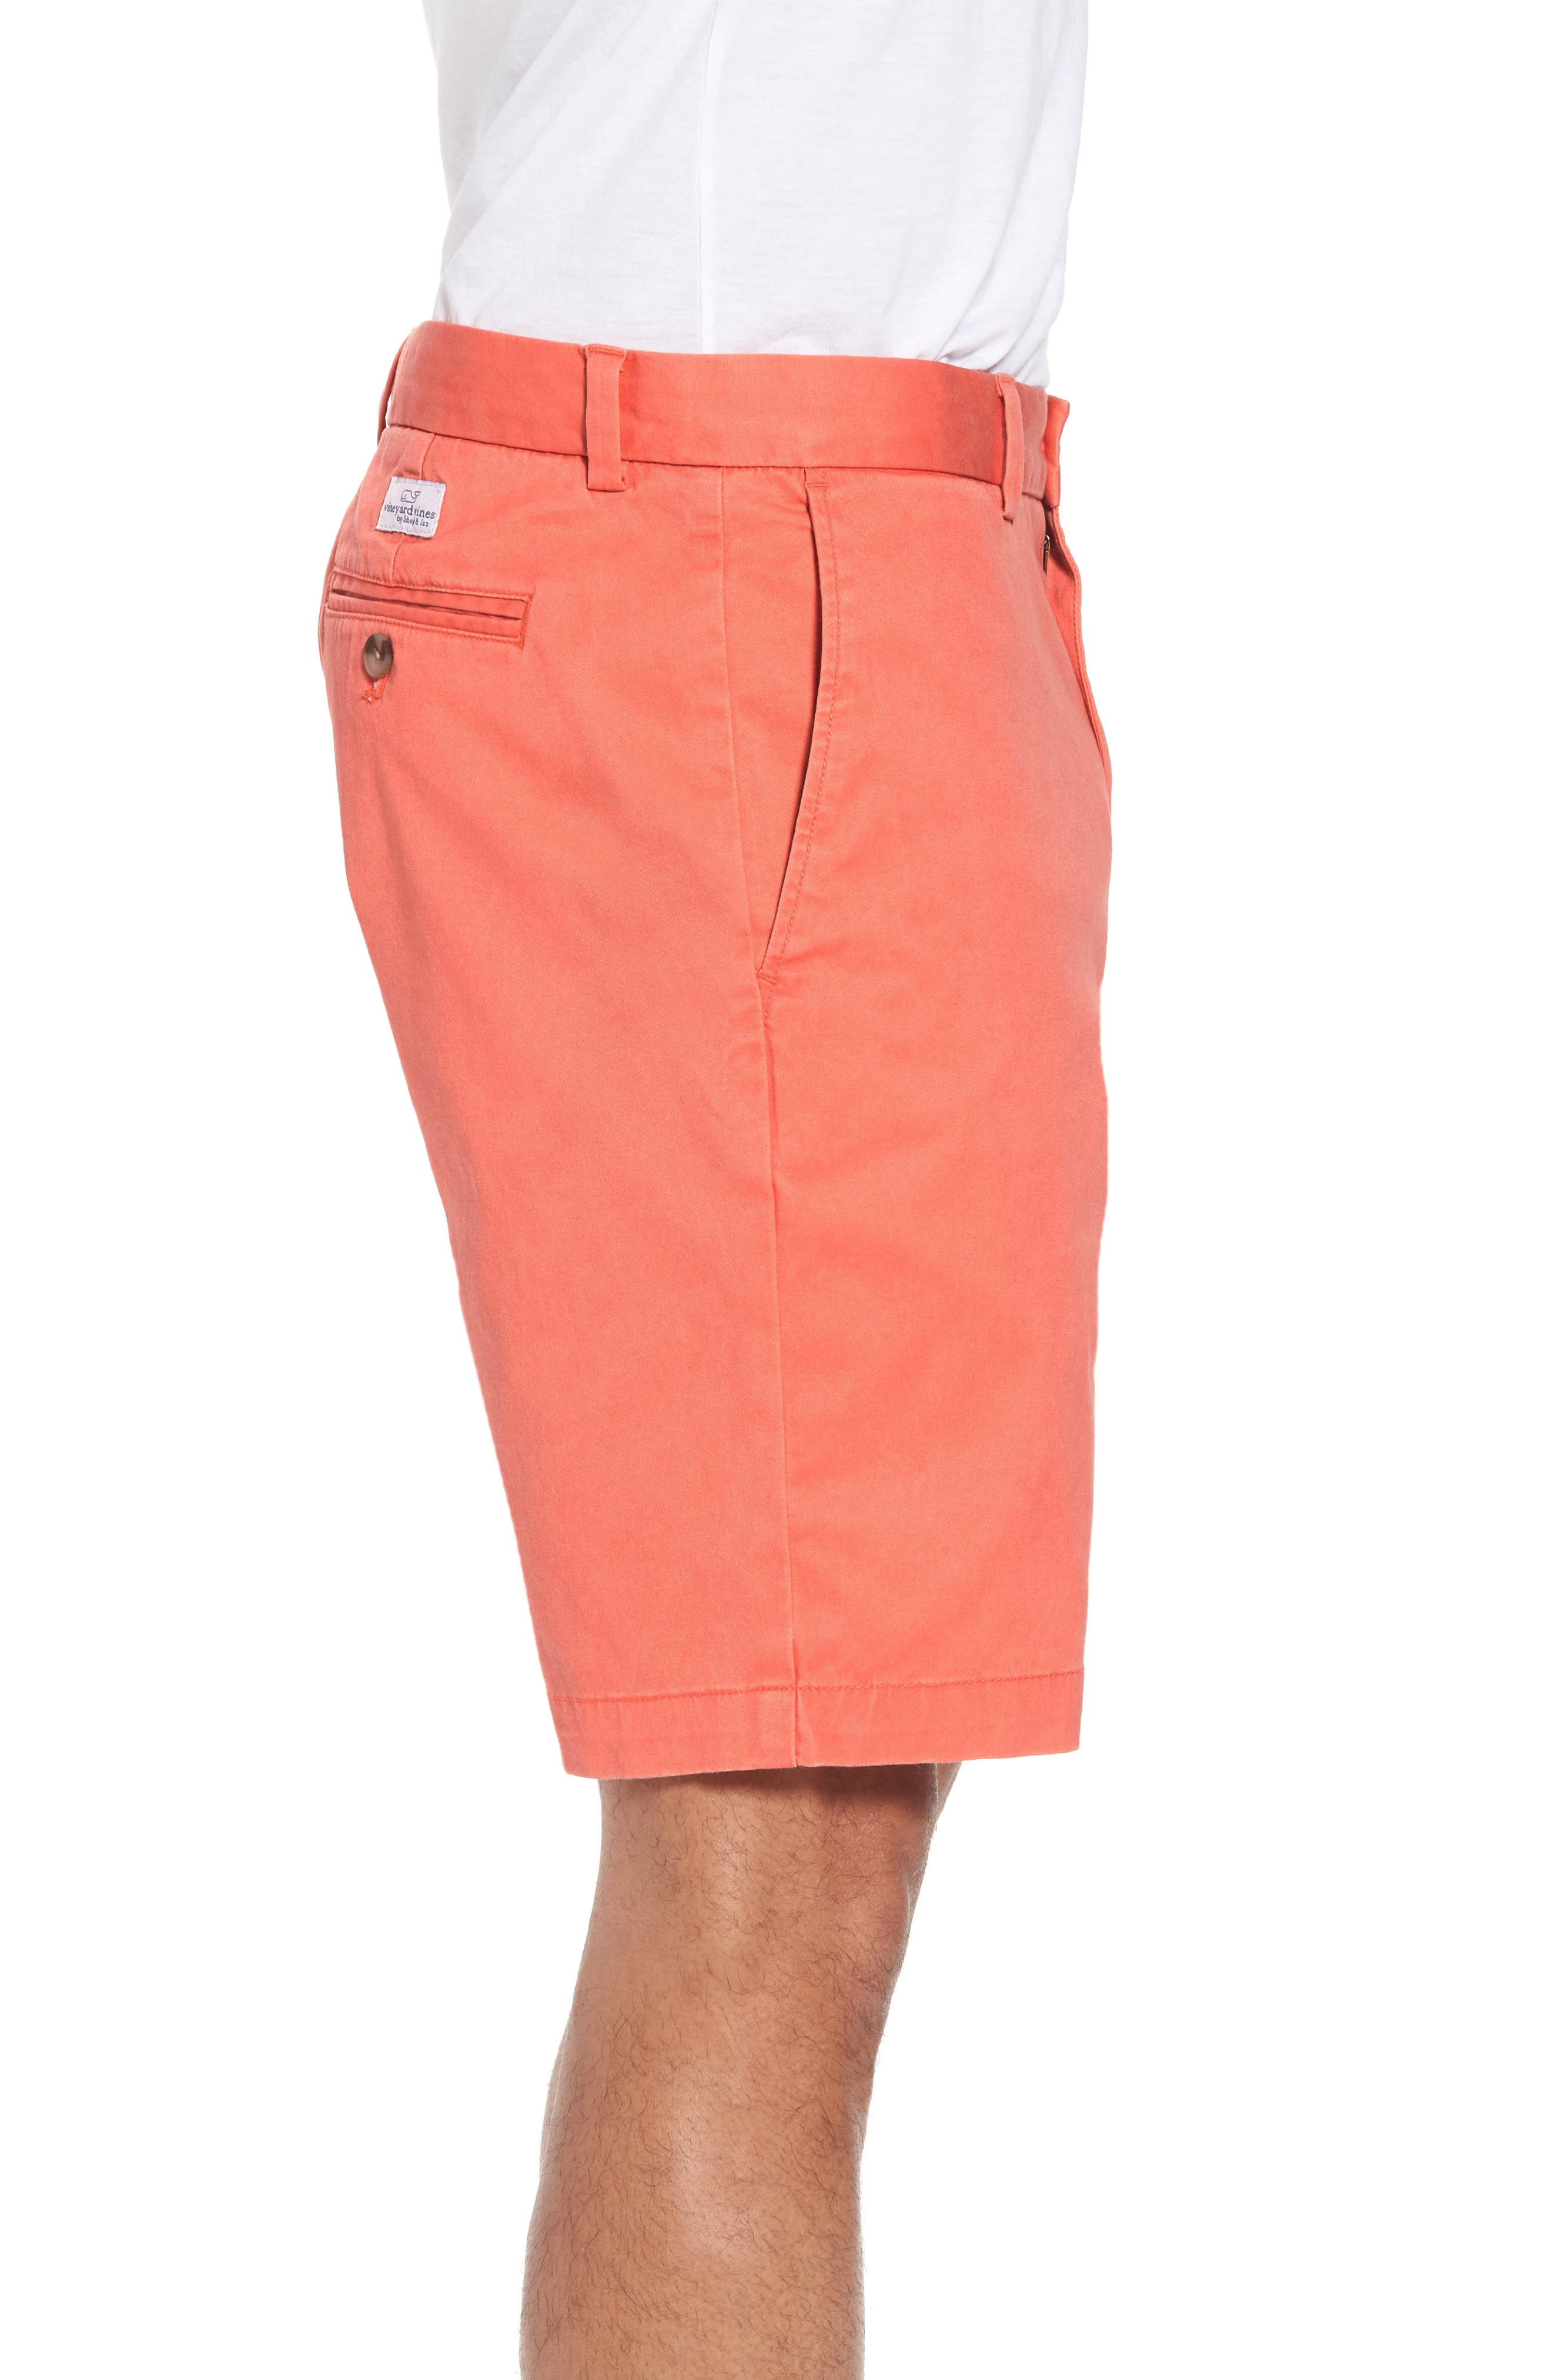 9 Inch Stretch Breaker Shorts,                             Alternate thumbnail 56, color,